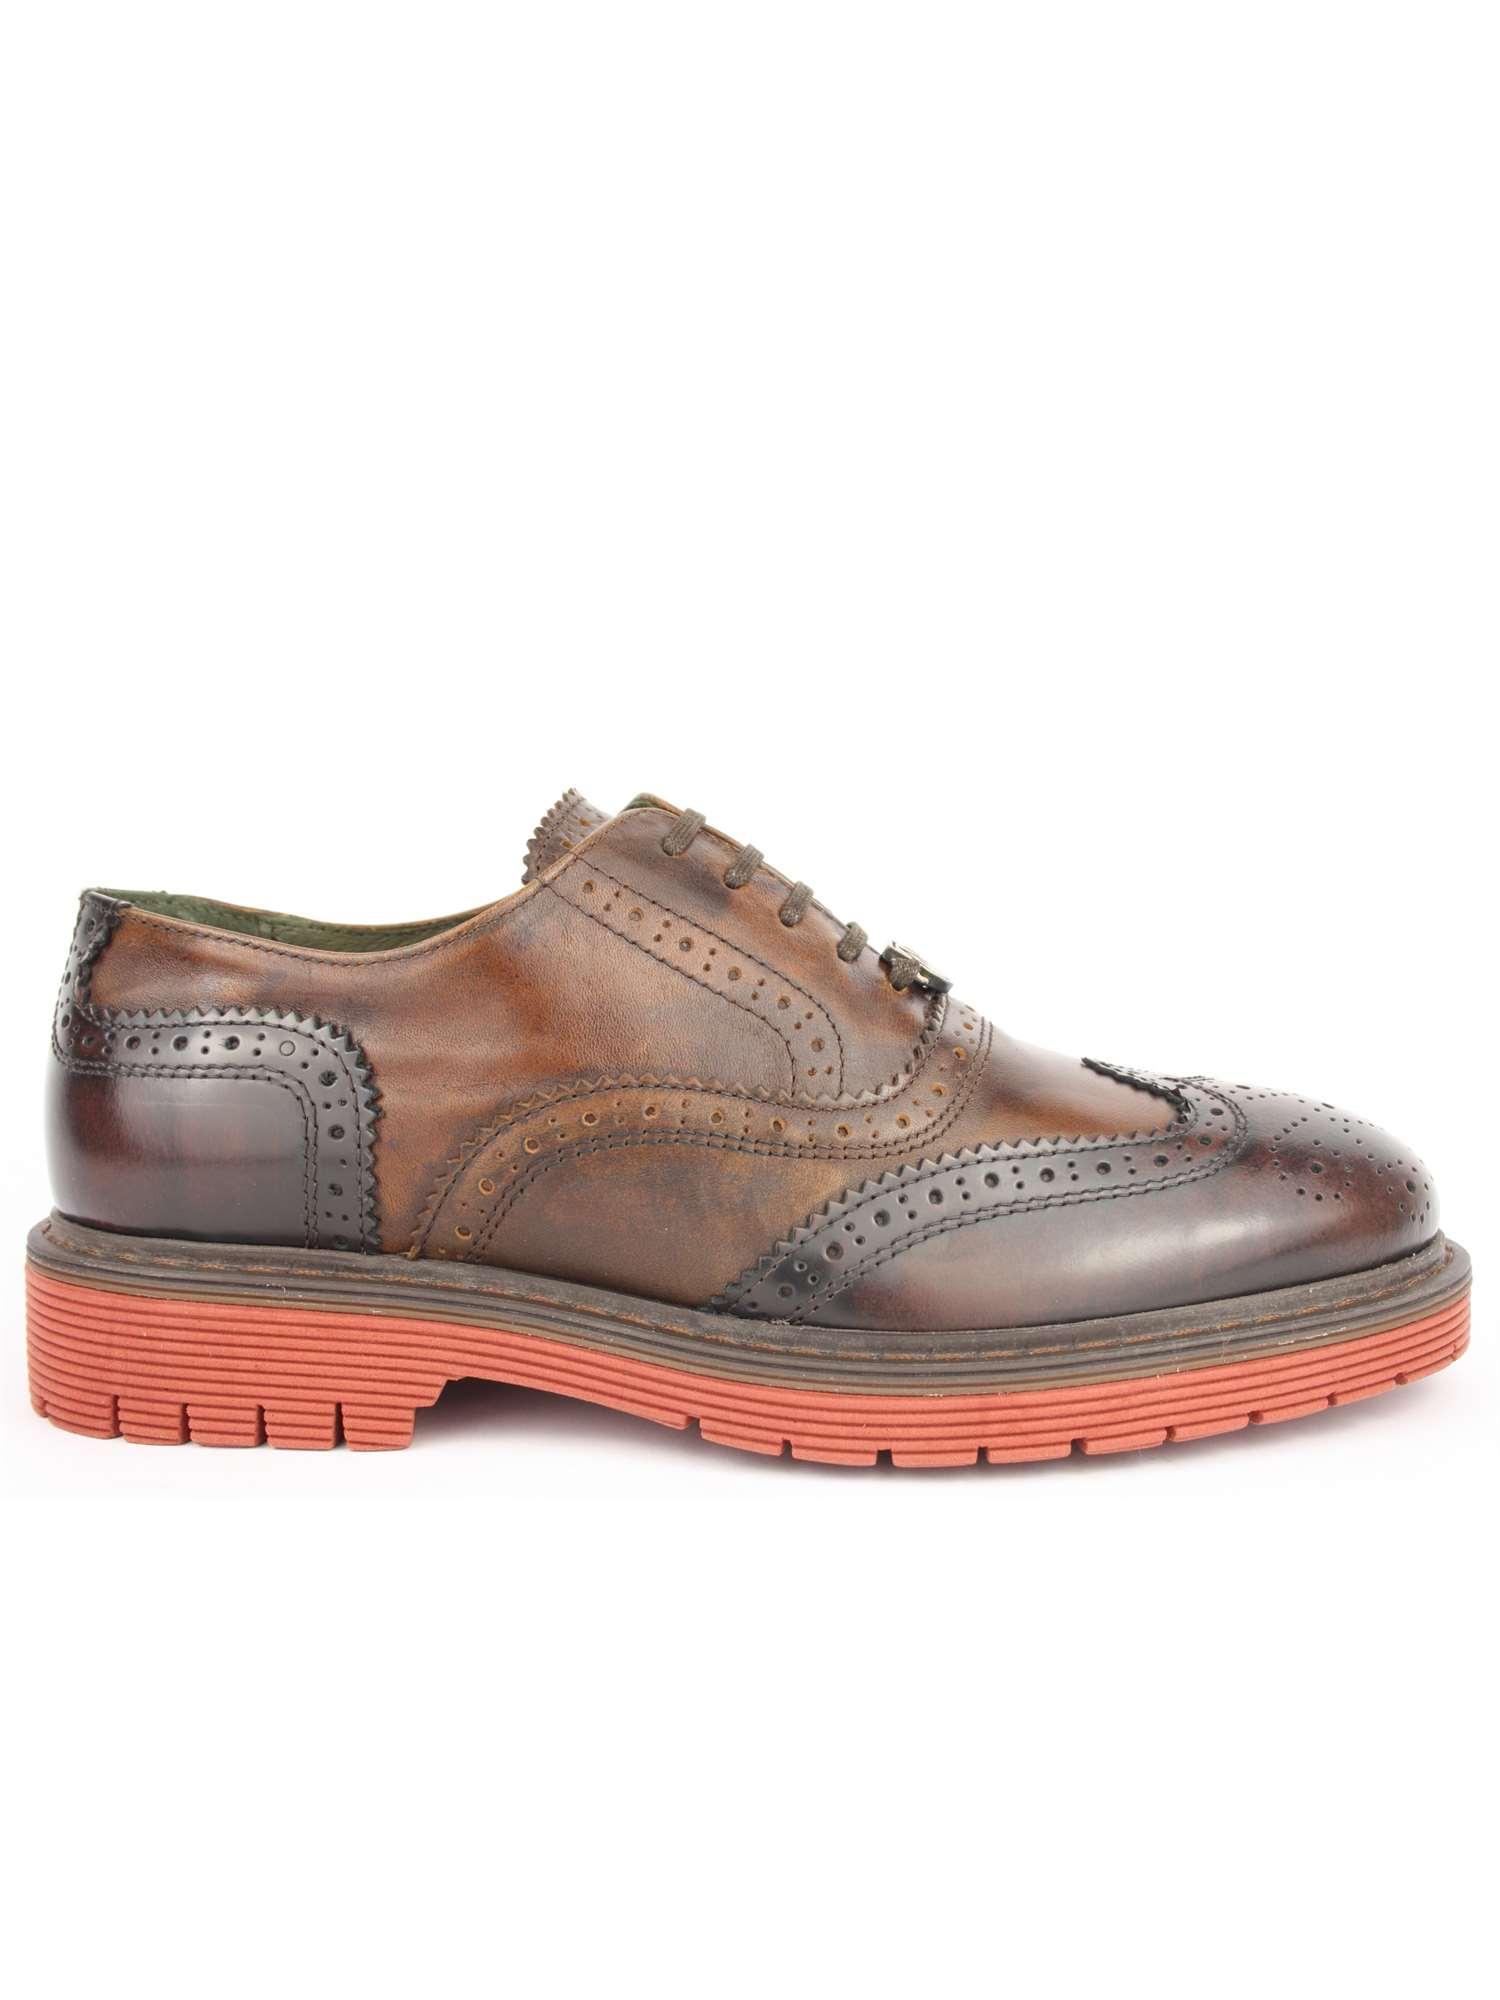 Ambitious Scarpa Marron Inglese Shoes Lacci Tipo AzAWvSHxq